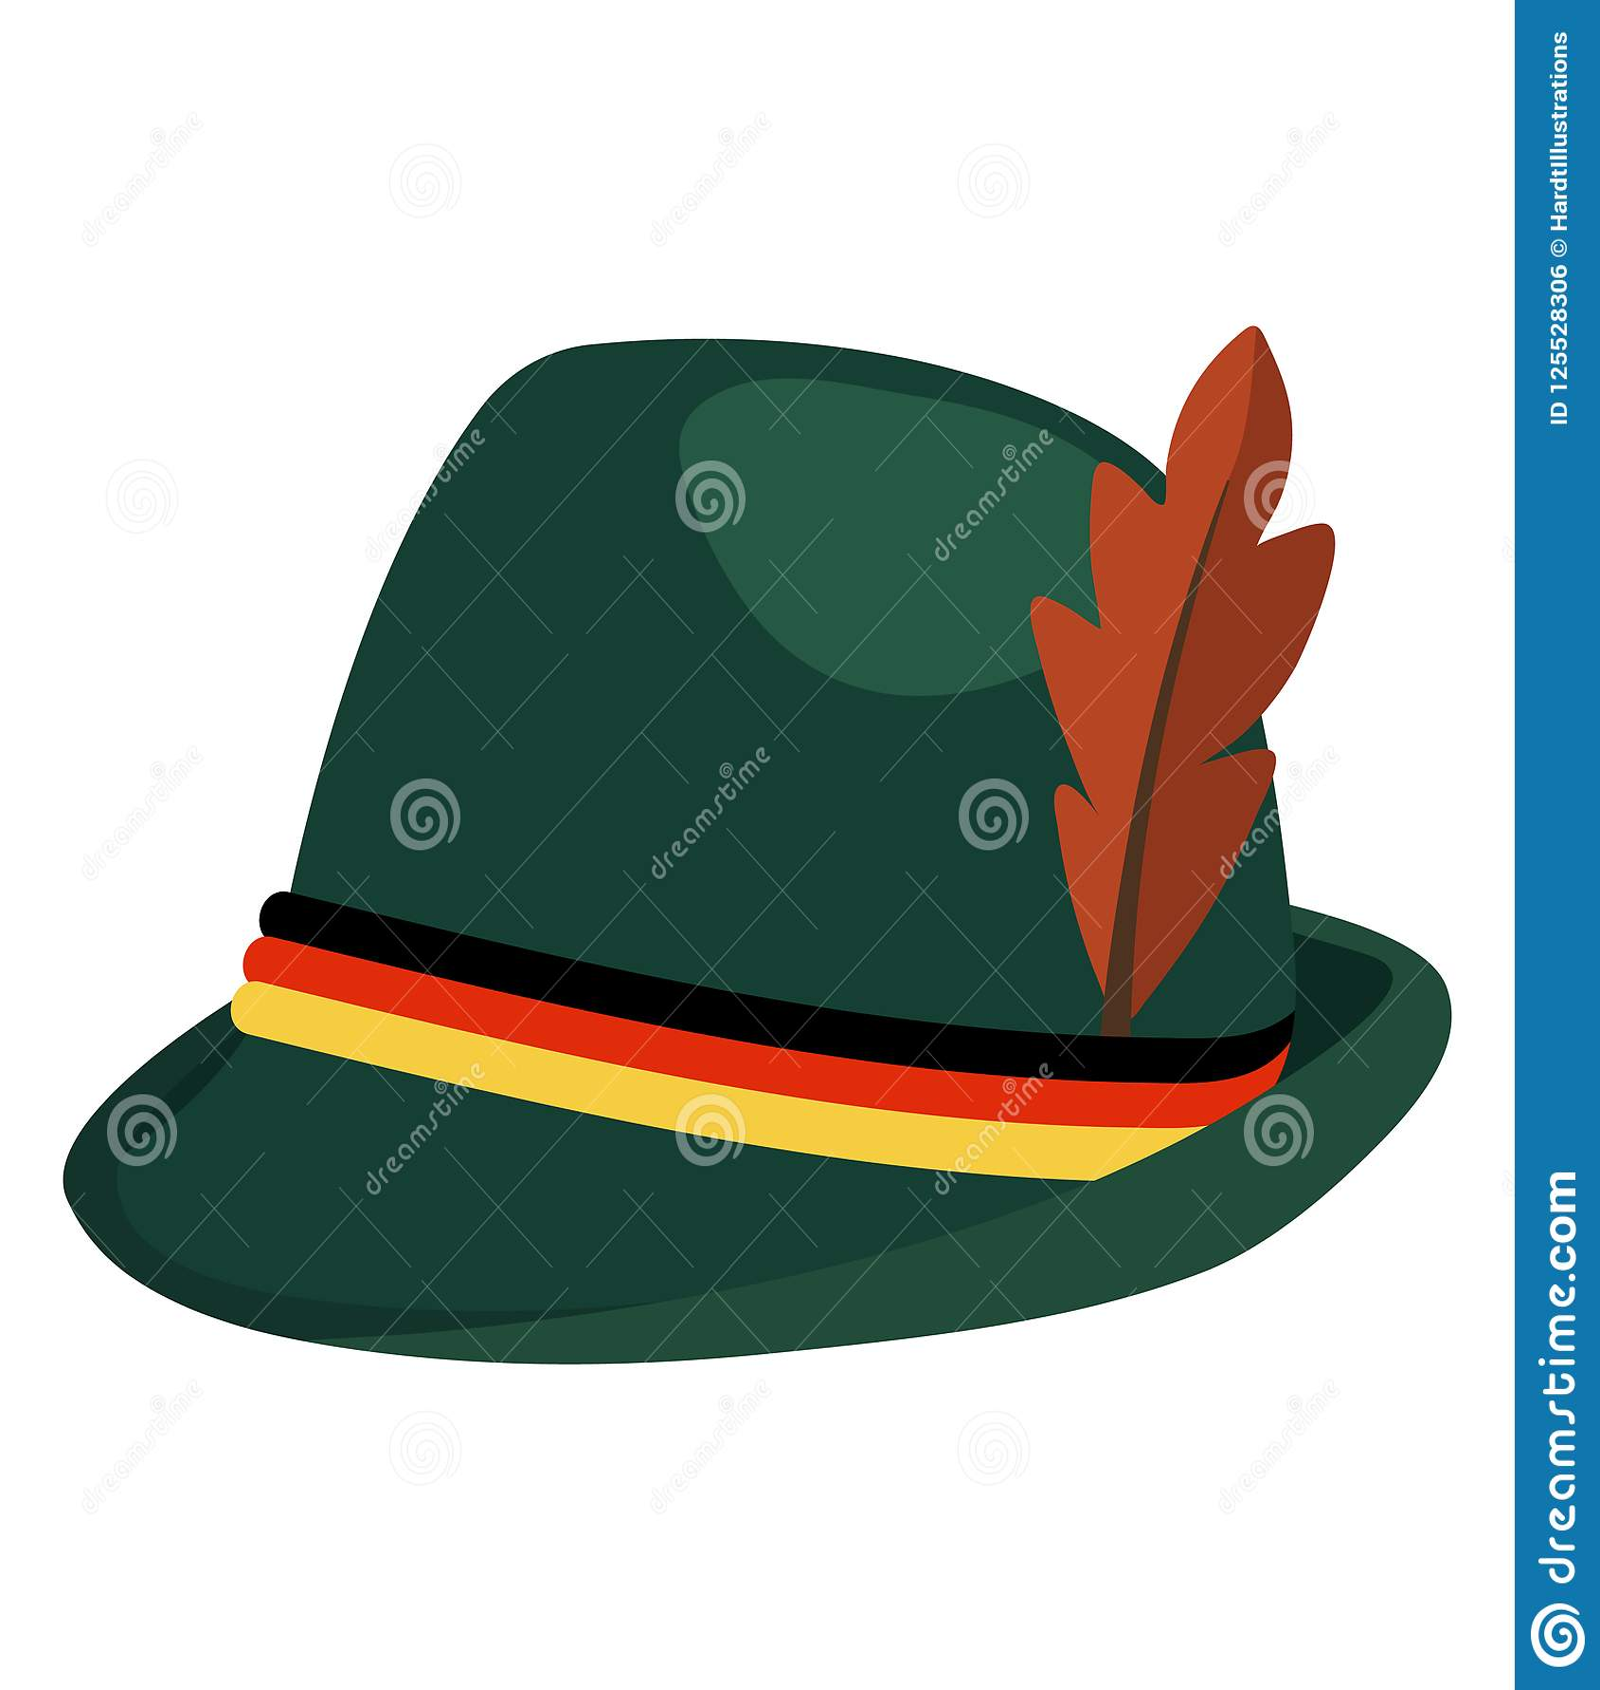 3c9d16ab167f6 Oktoberfest Green Alpine Hat Stock Vector - Illustration of cute ...